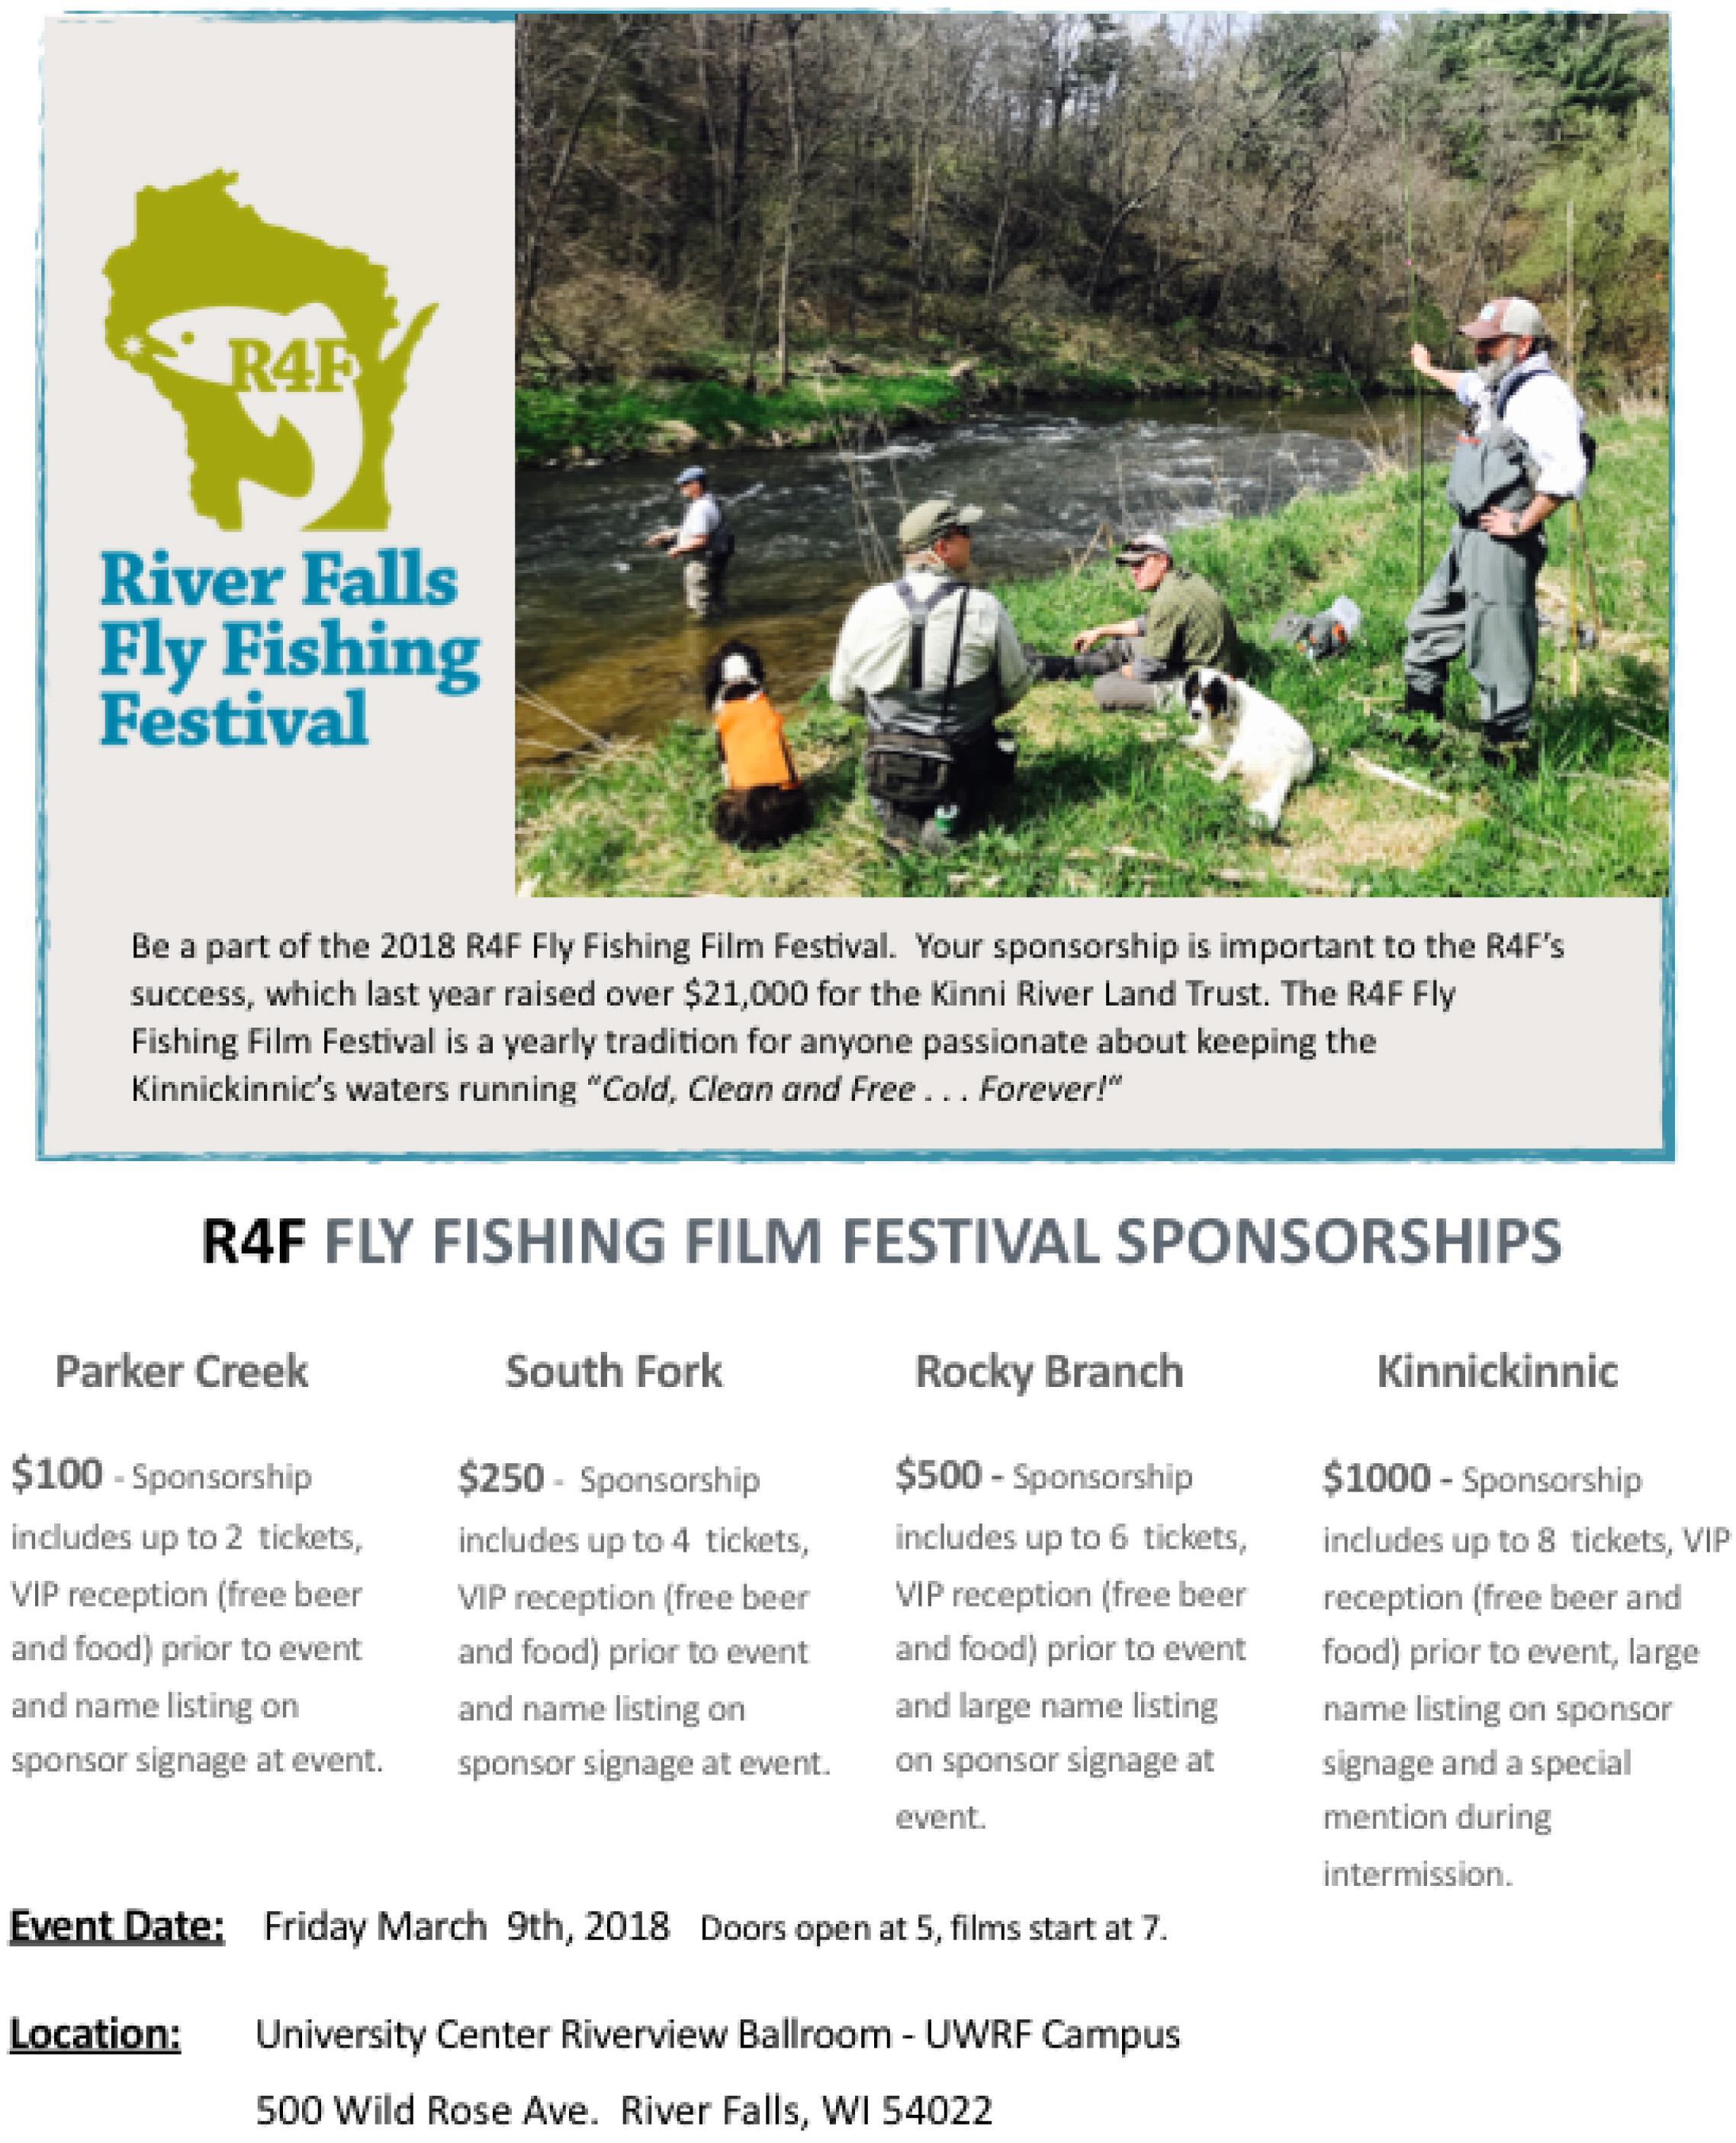 River Falls Fly Fishing Film Festival